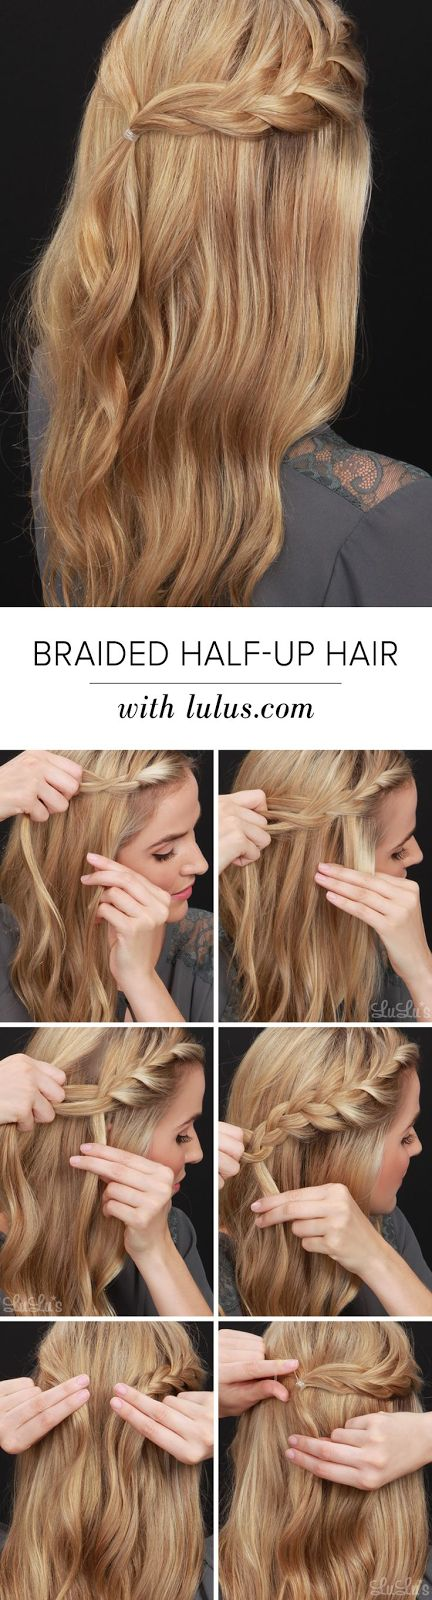 Half-Up Braided Hair Tutorial